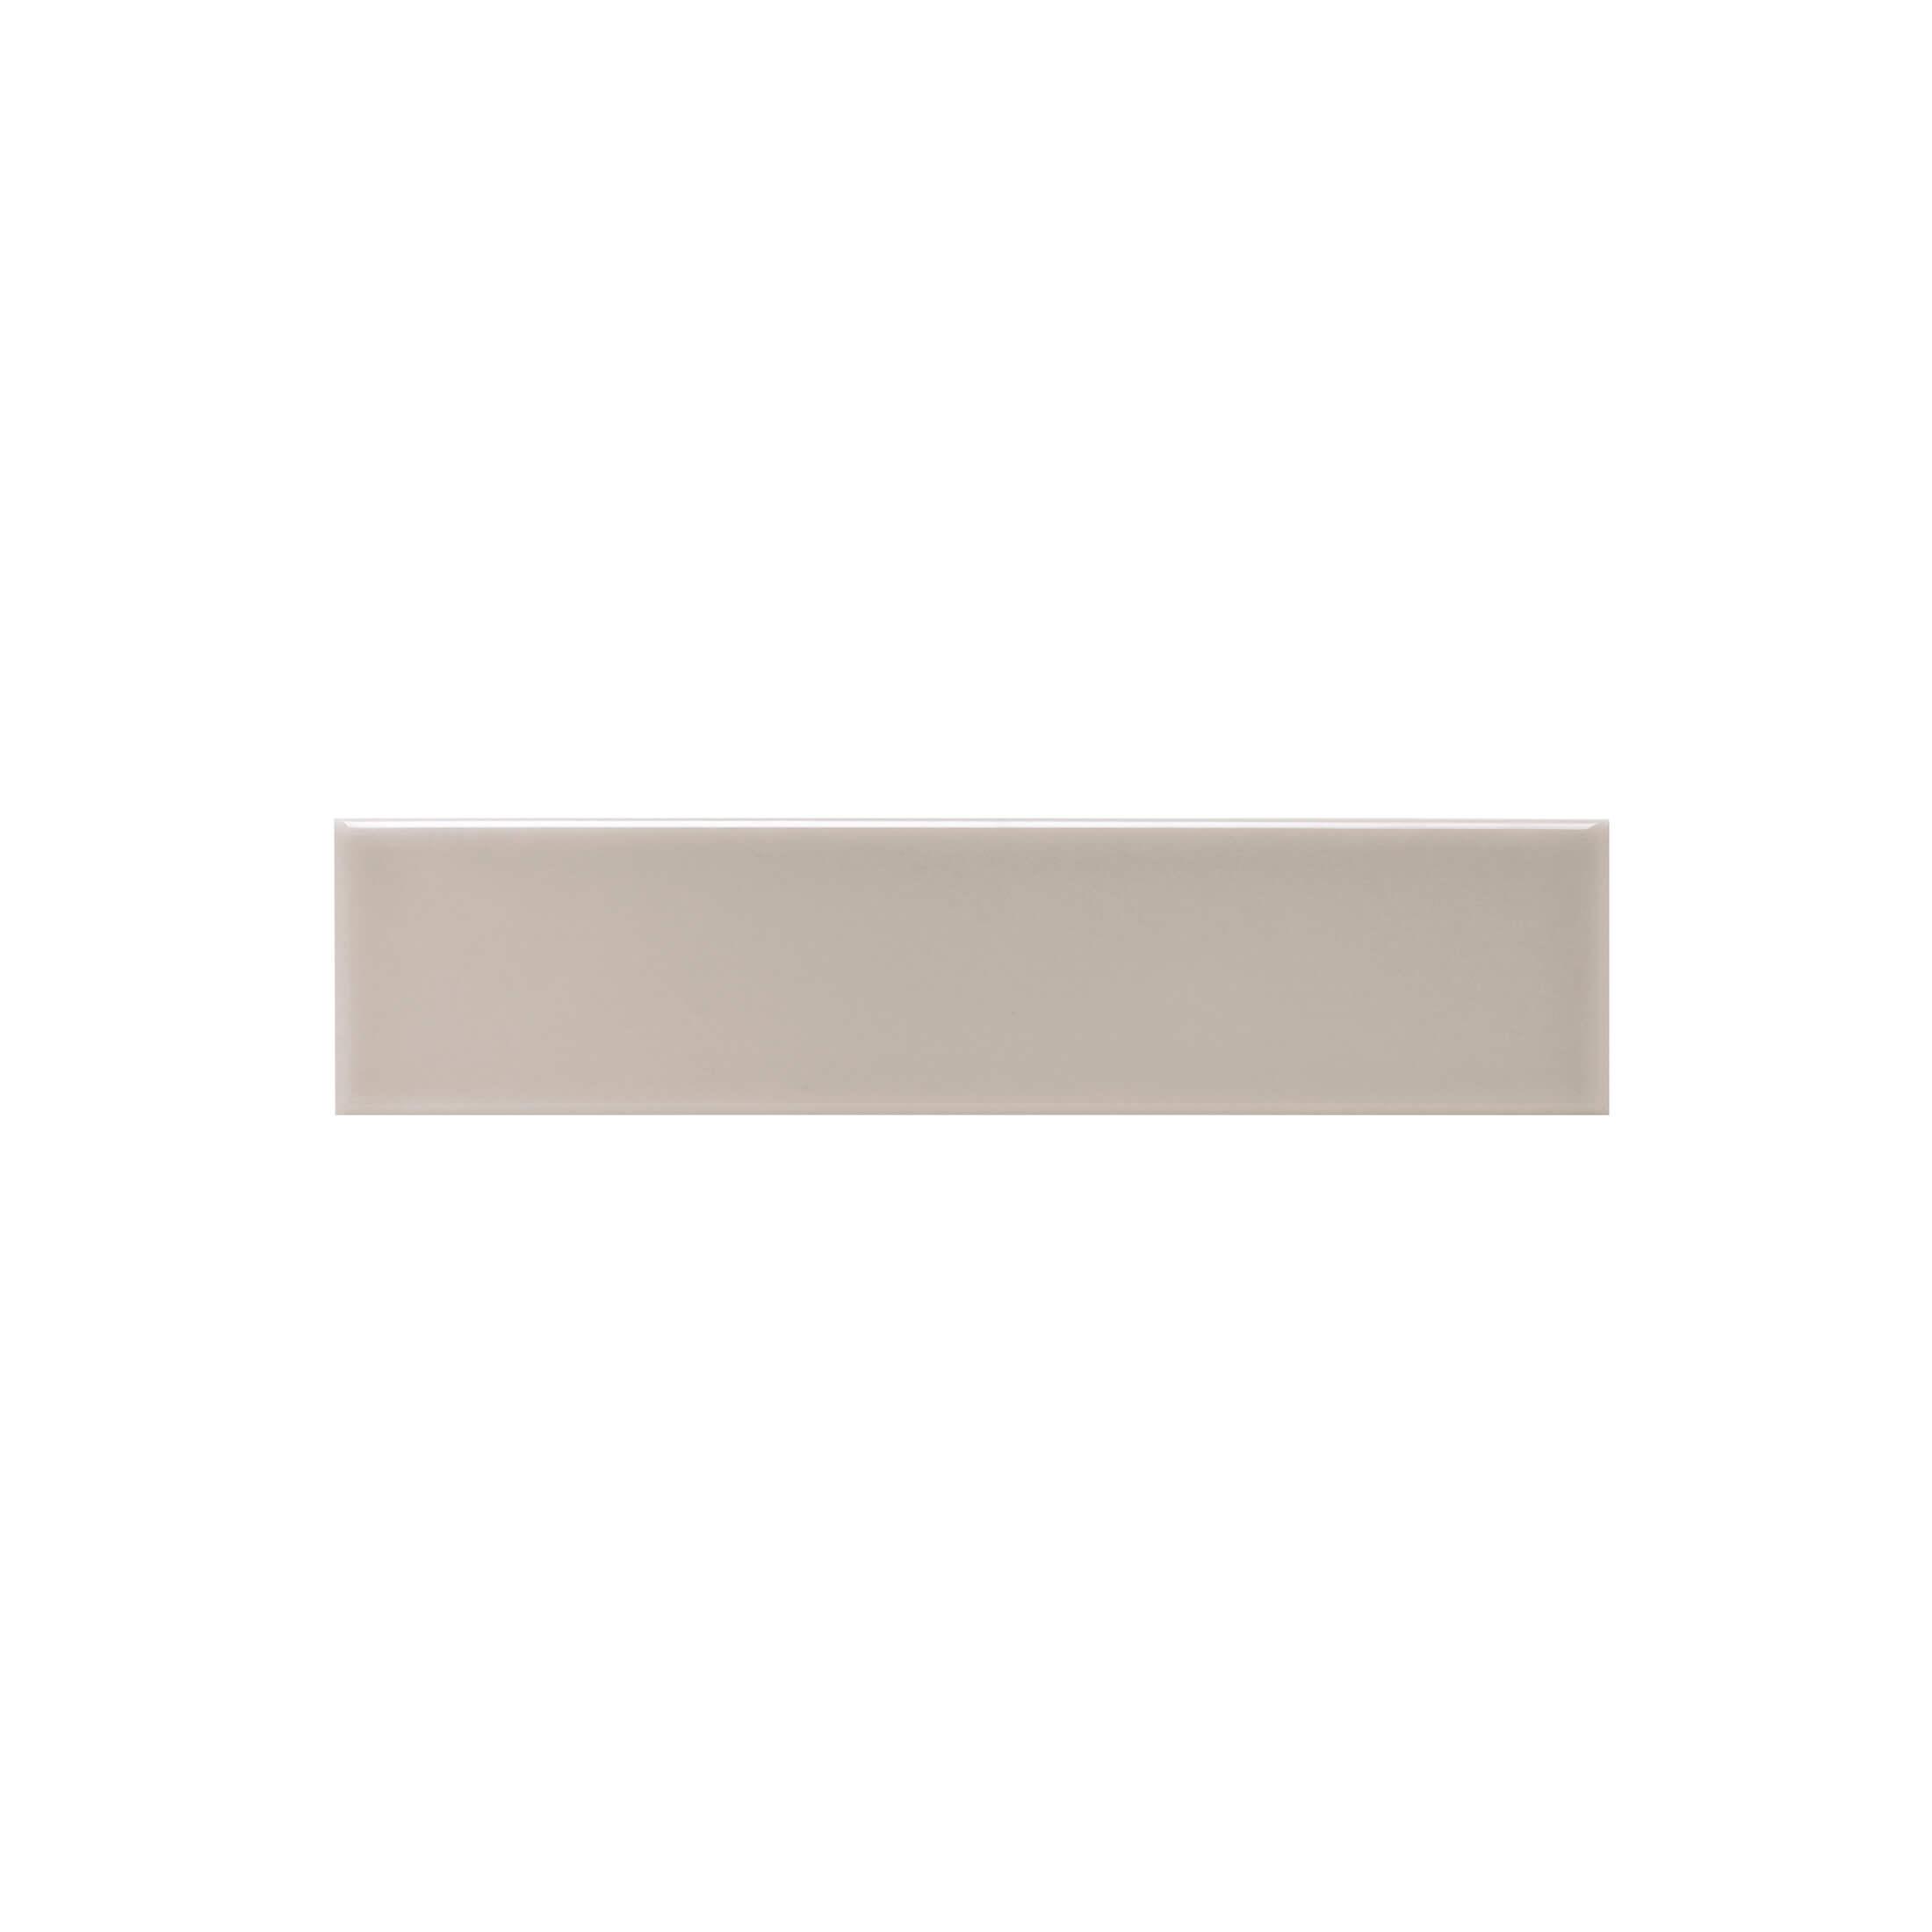 ADNE1095 - LISO PB - 5 cm X 20 cm